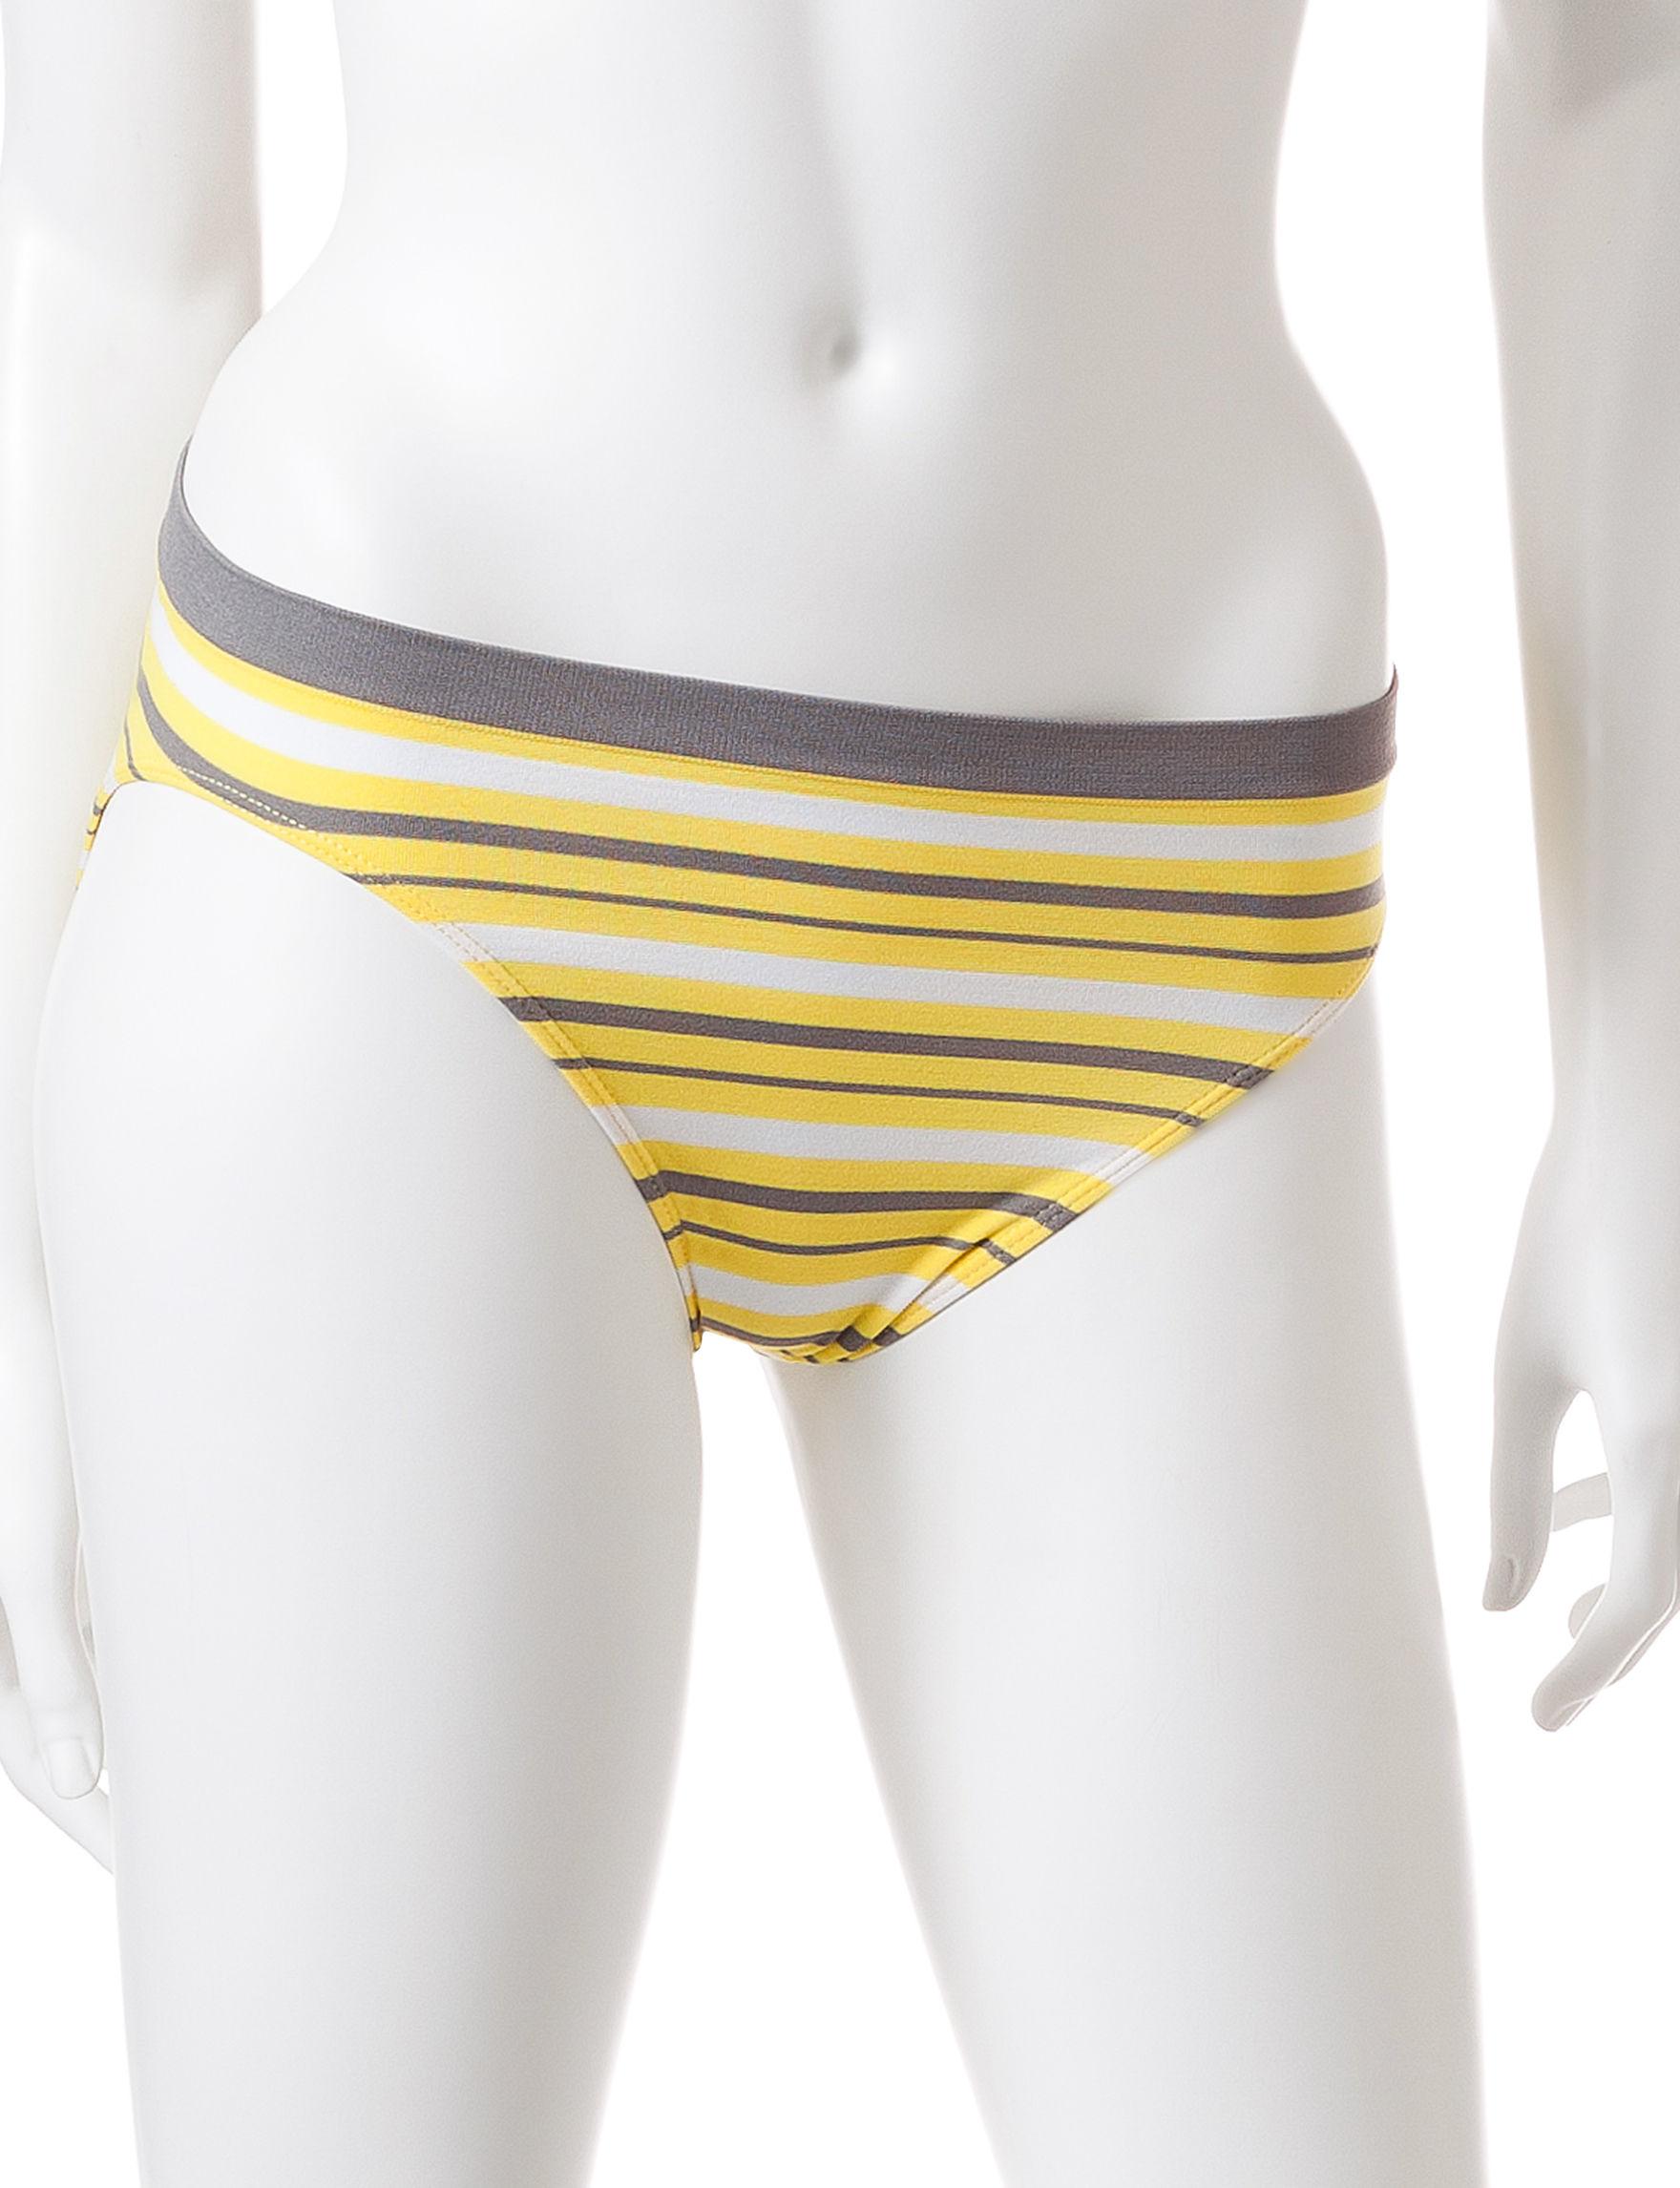 Rene Rofe Yellow Stripe Panties High Cut